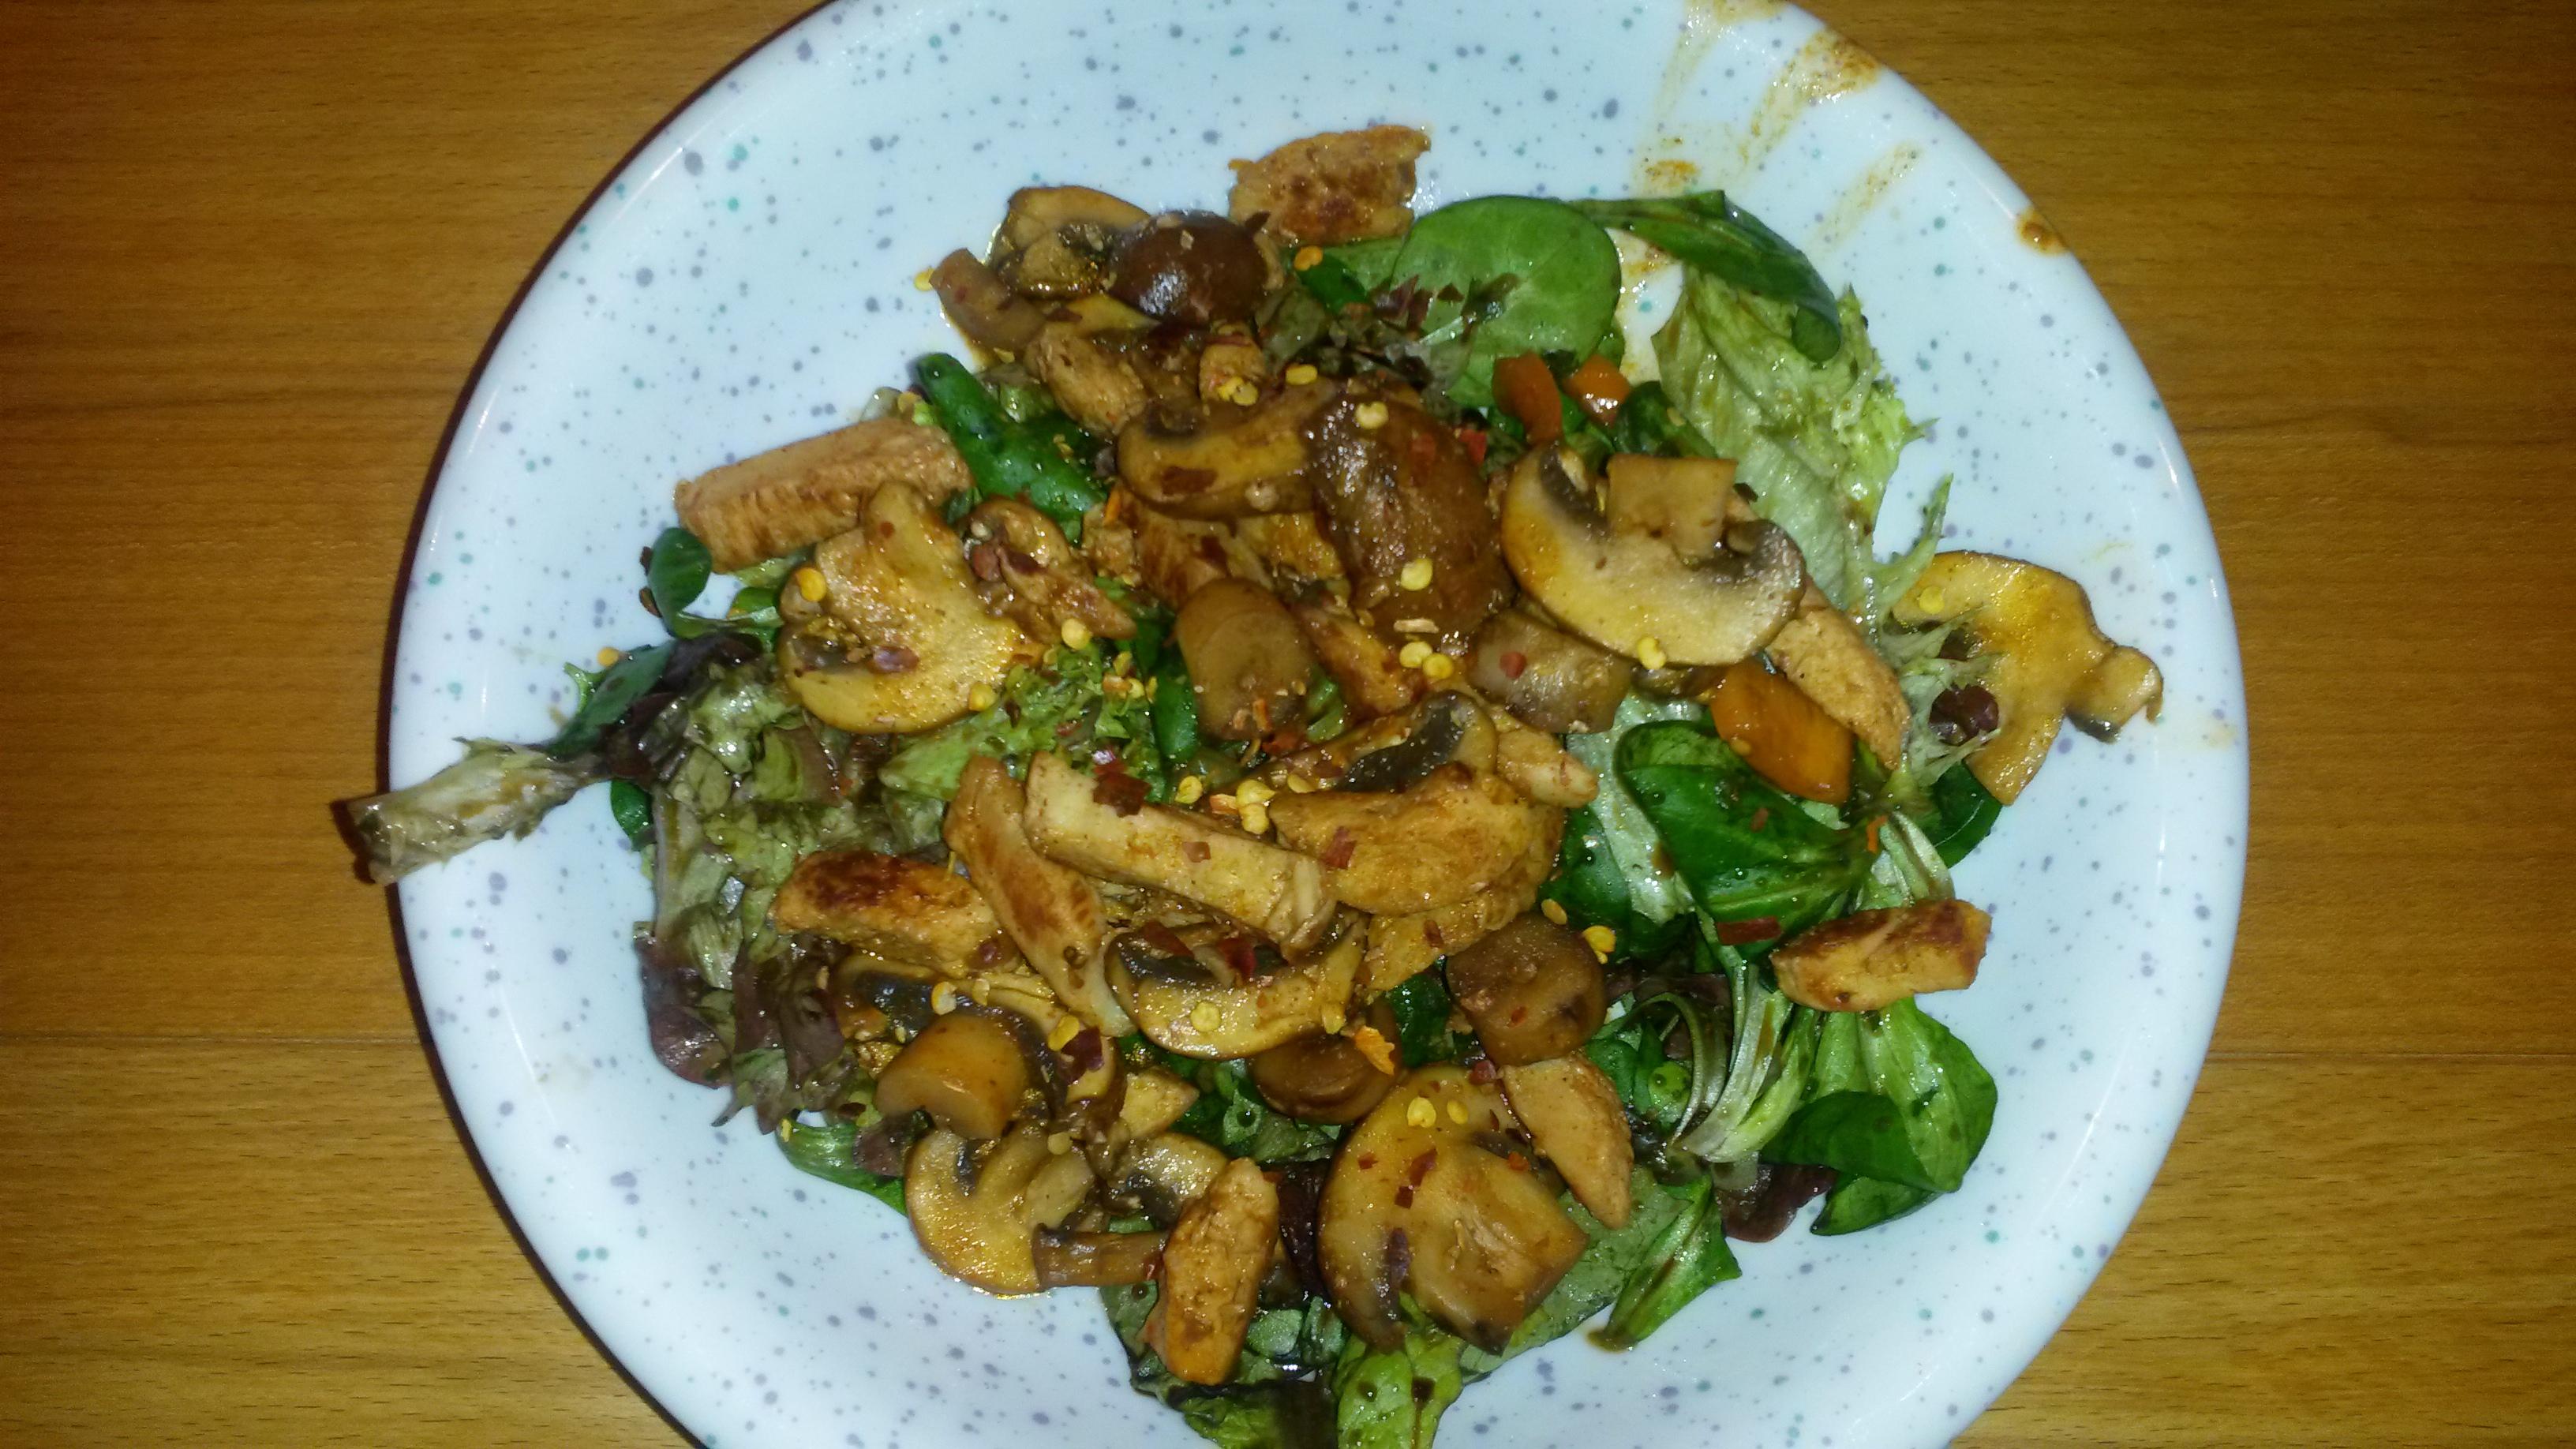 http://foodloader.net/sk0r_2014-03-08_Salat_mit_Haehnchenbruststreifen.jpg